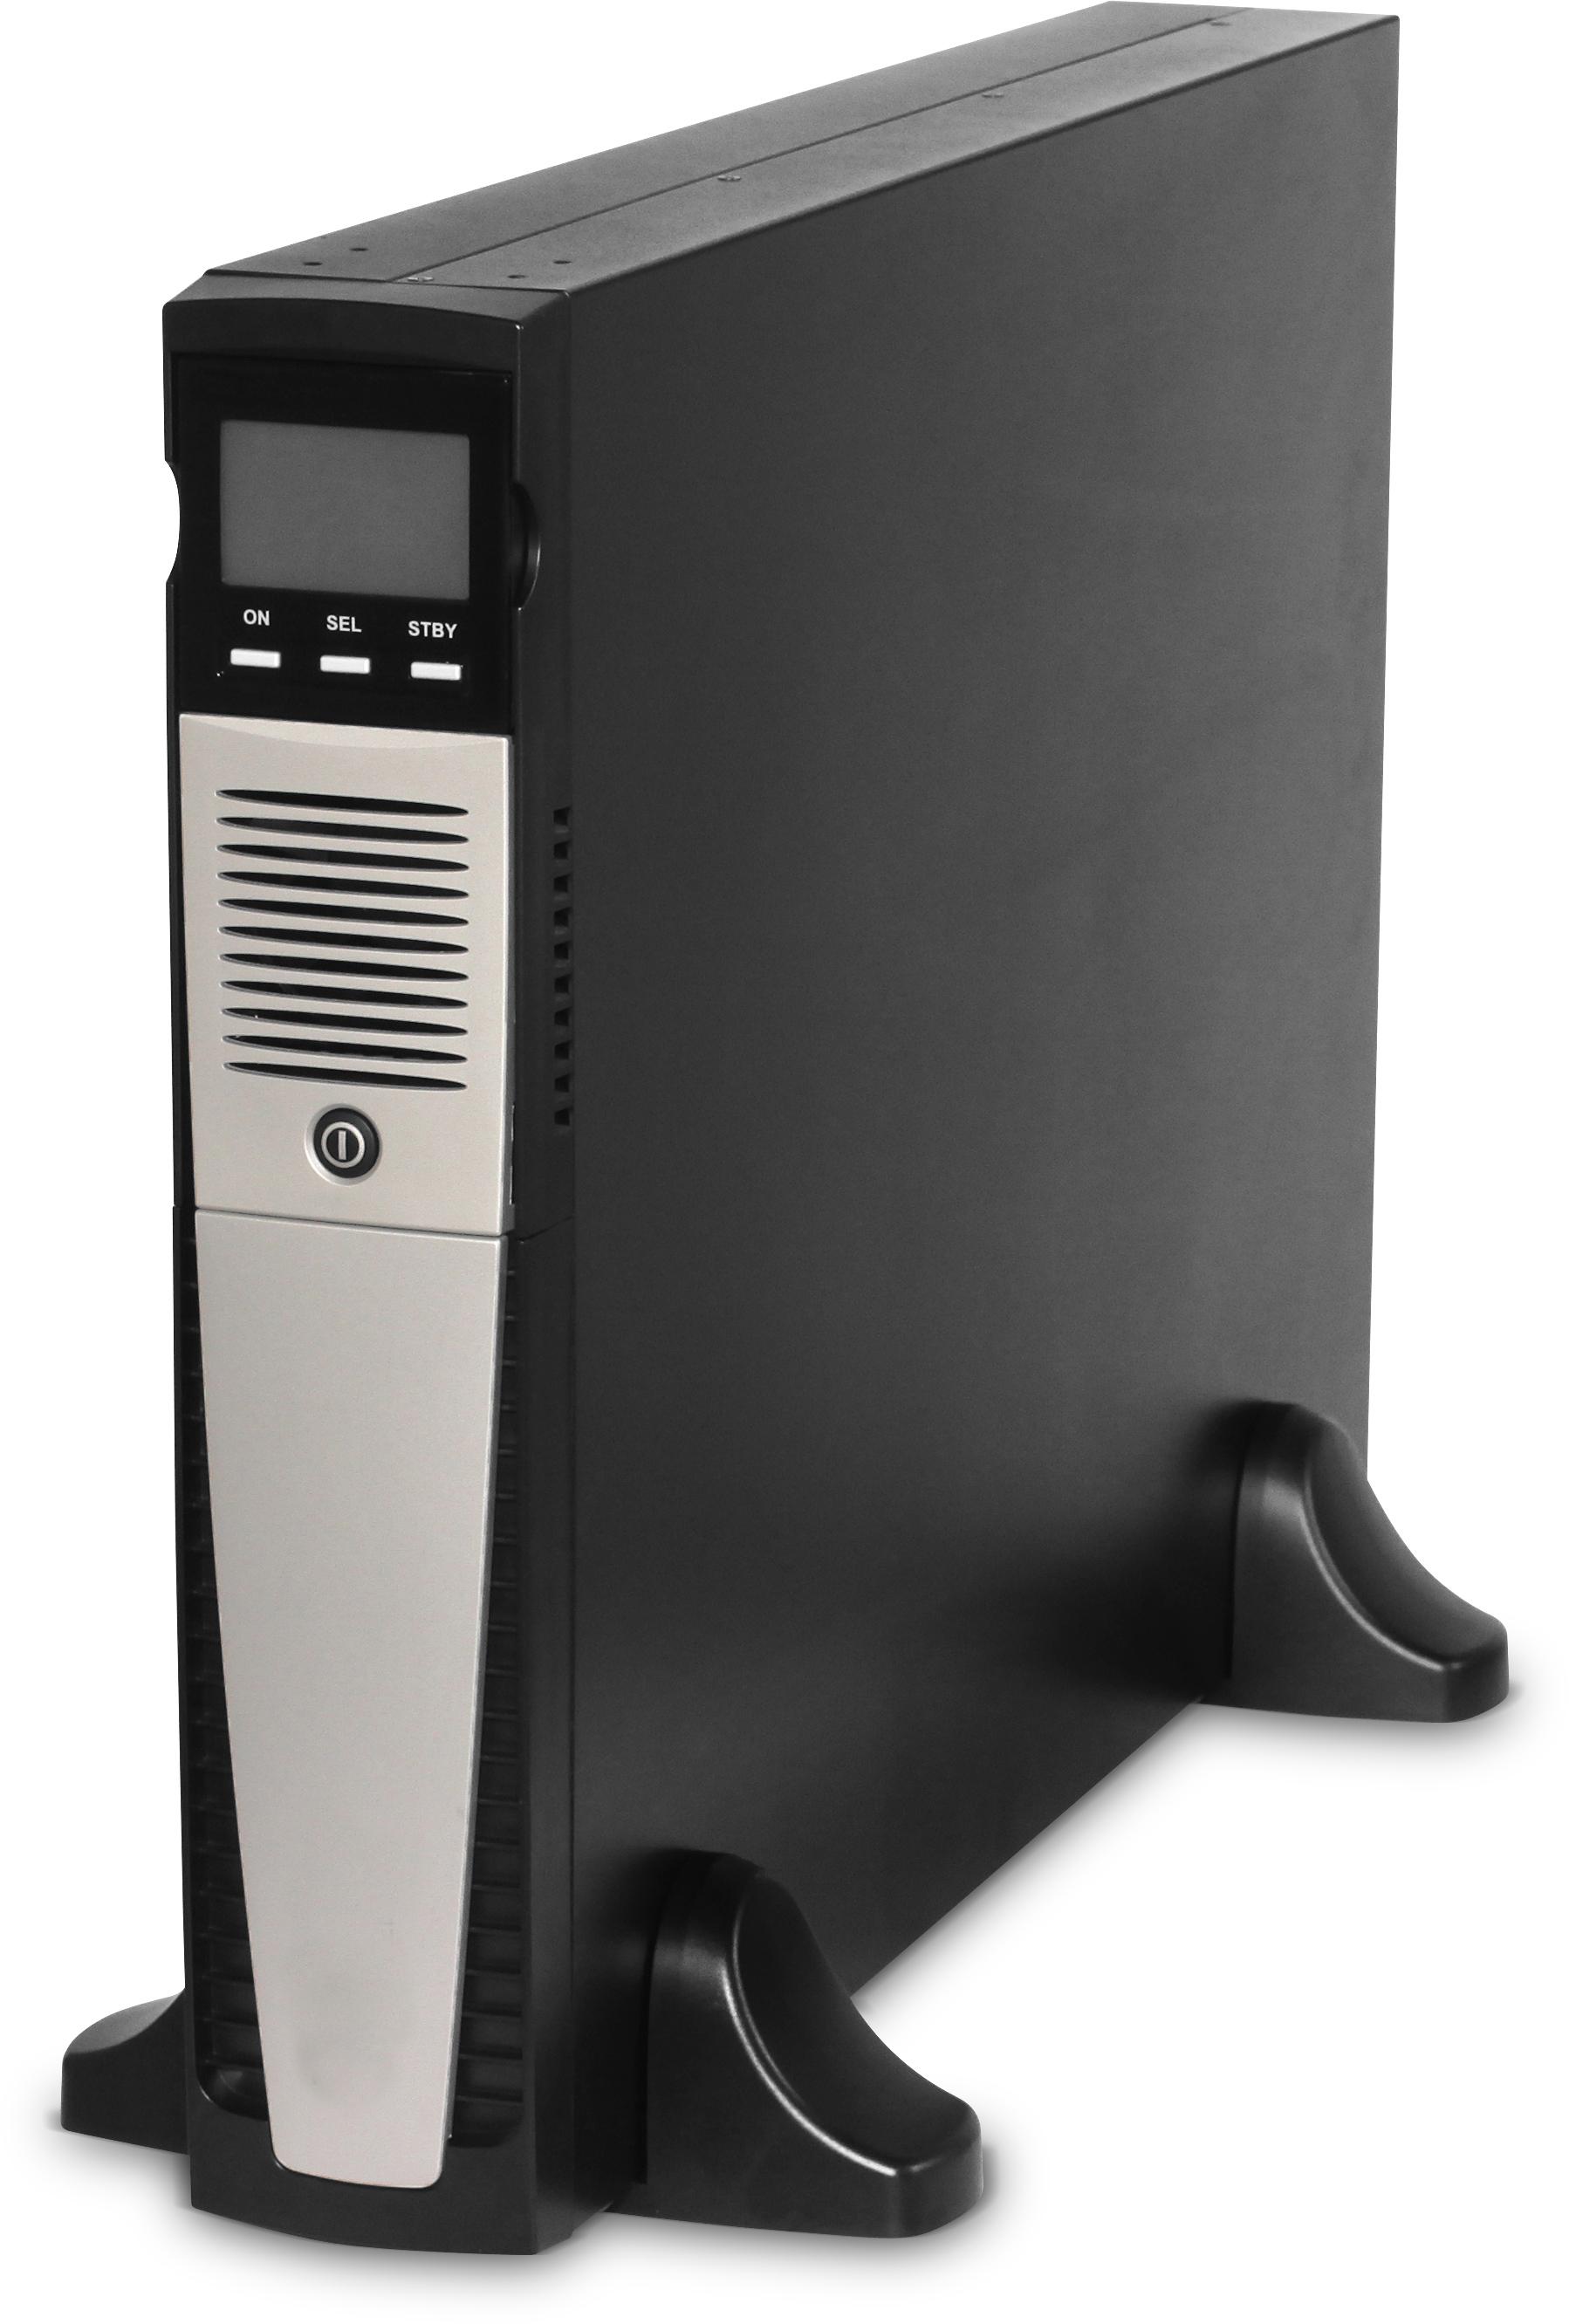 1 Stk USV GENIO Dual Midi ER 3000VA 2400W 0 Min.1/1ph./Online USPRD300ER